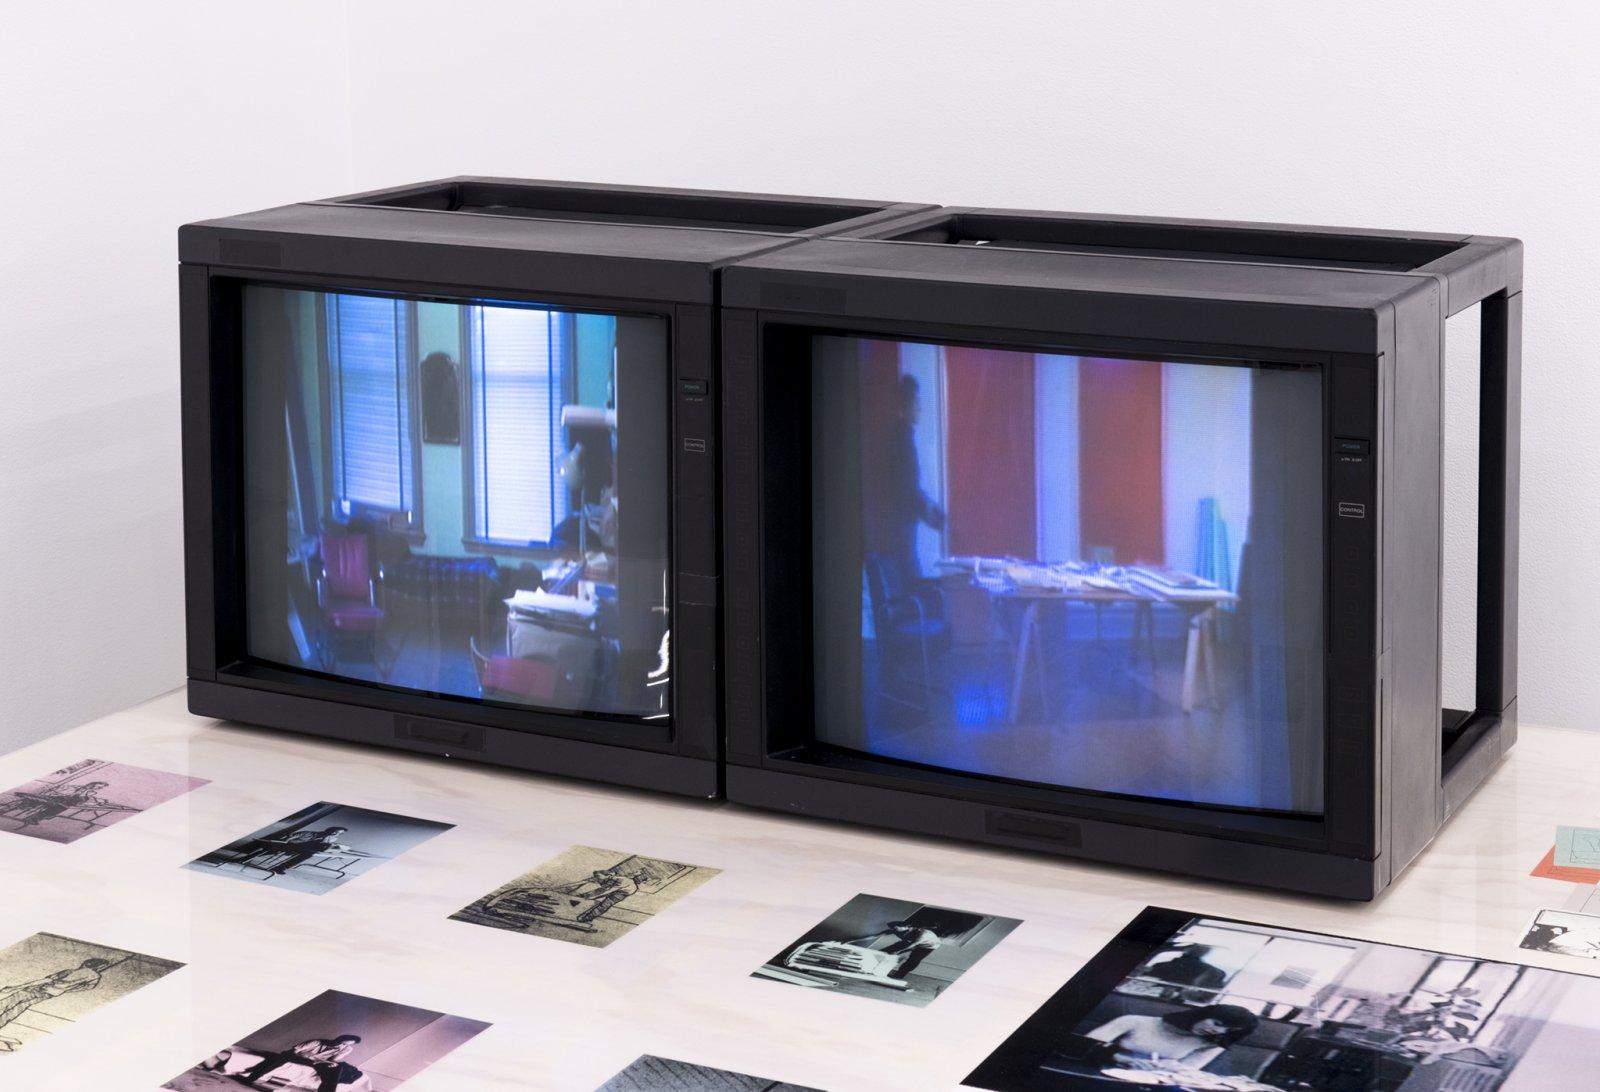 Ian Wallace, Studio Work, 1979, 2 channel video, 3/4 inch video transferred to DVD by Ian Wallace